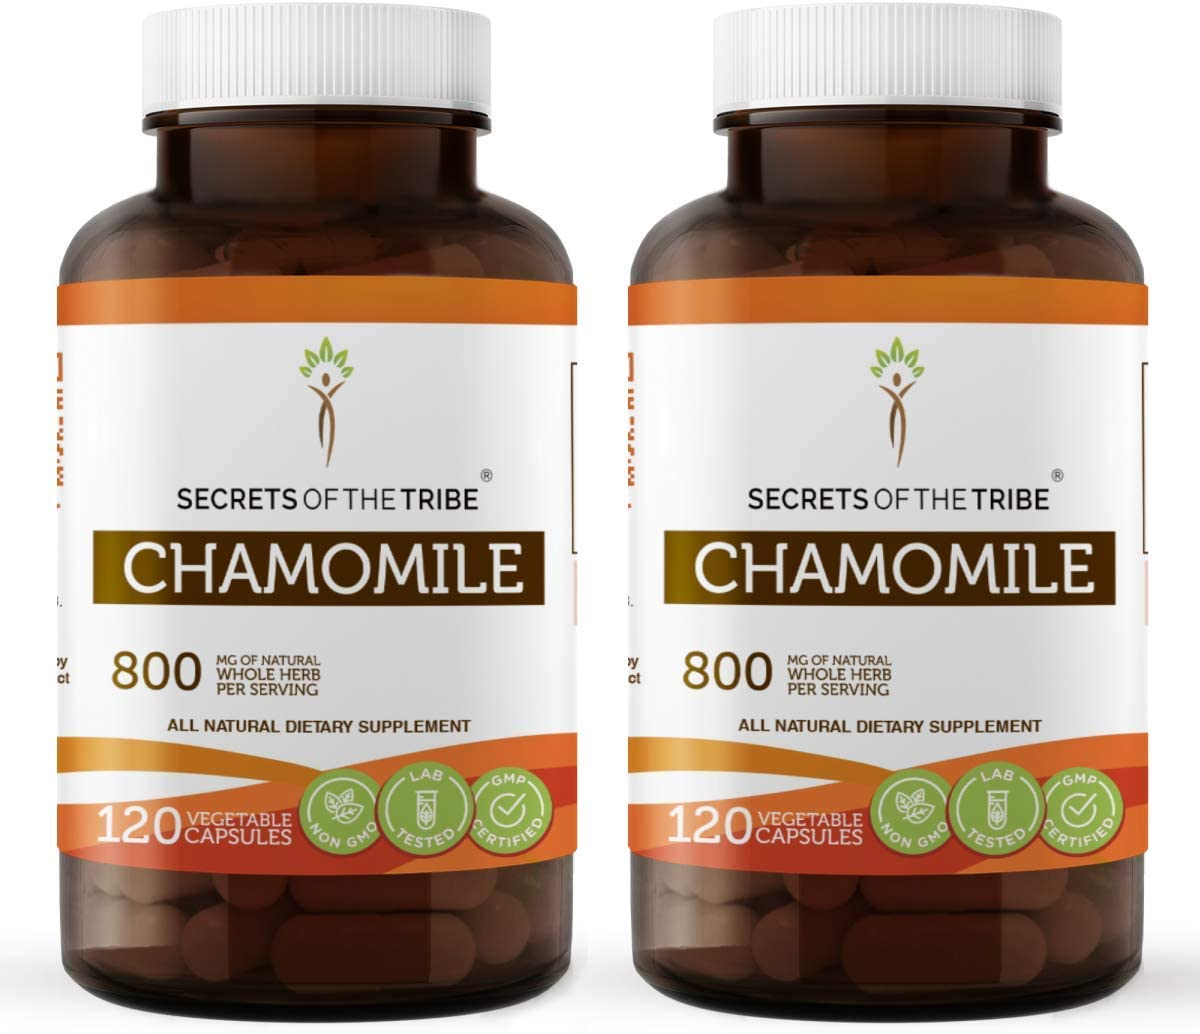 Chamomile 120 Capsules 2 pcs. mg Max 40% OFF 800 Organic 40% OFF Cheap Sale Matri